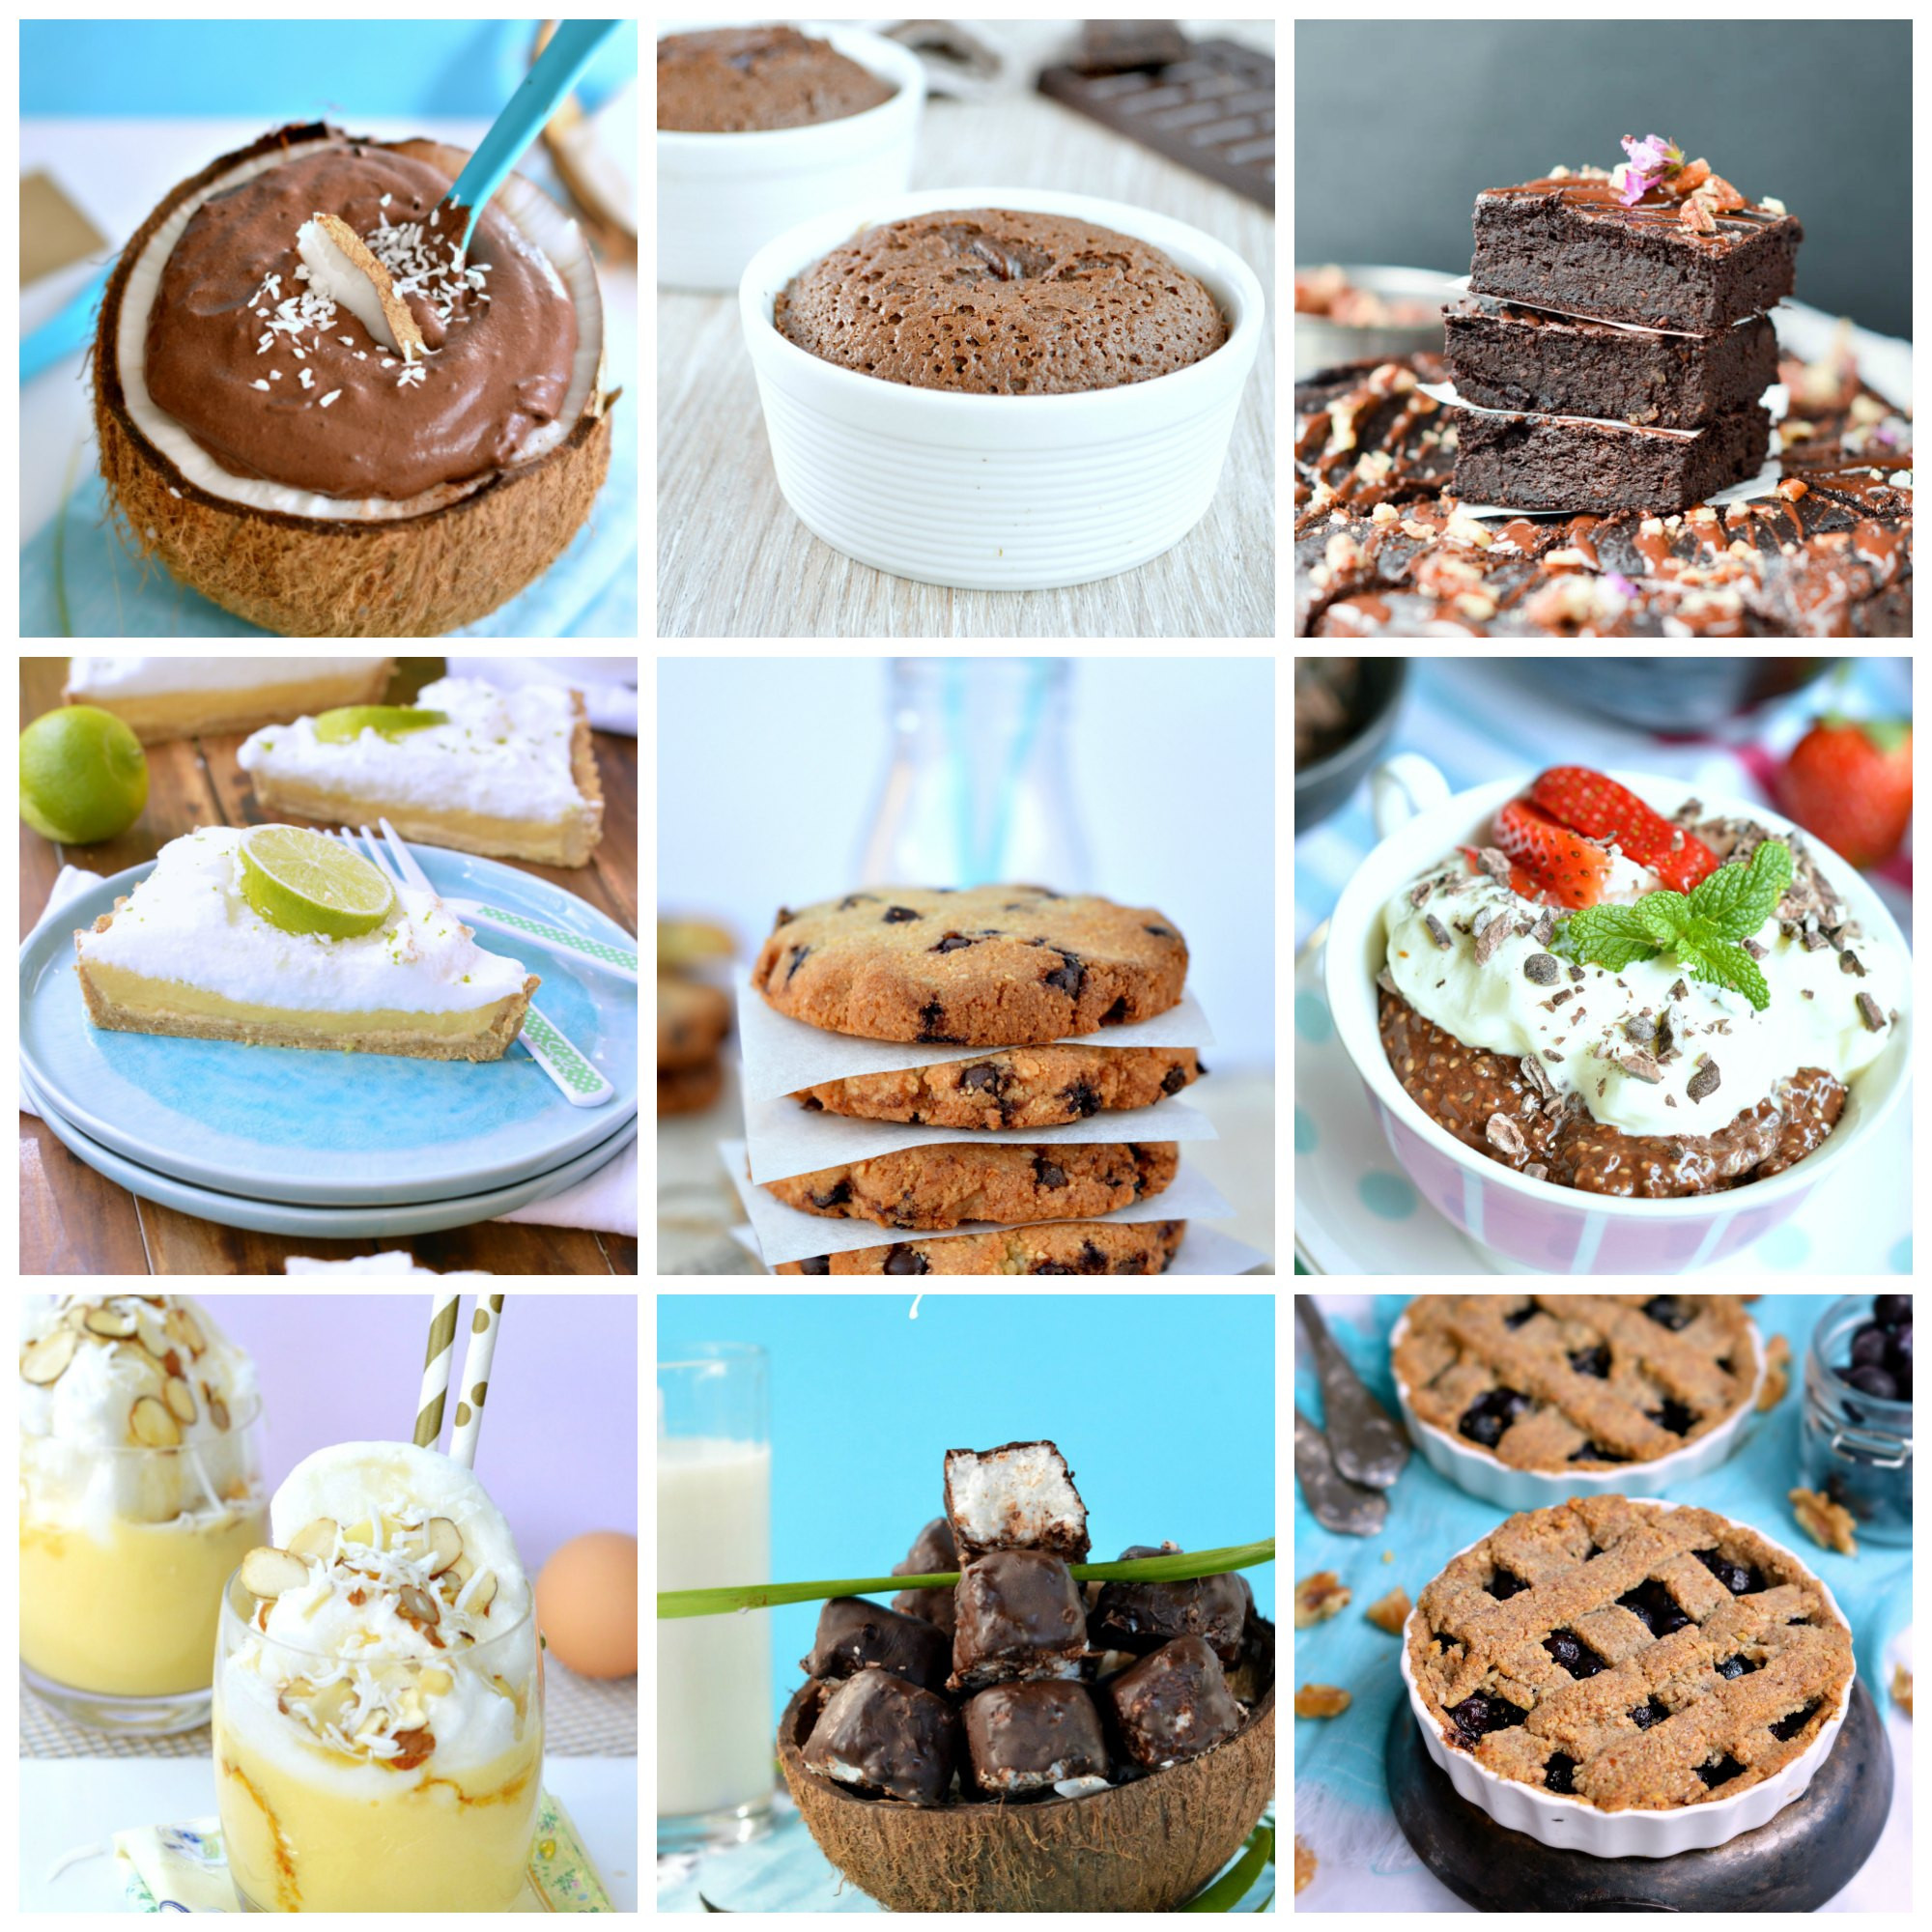 Good Desserts For Diabetics  10 Sugar Free Desserts for diabetics Sweetashoney